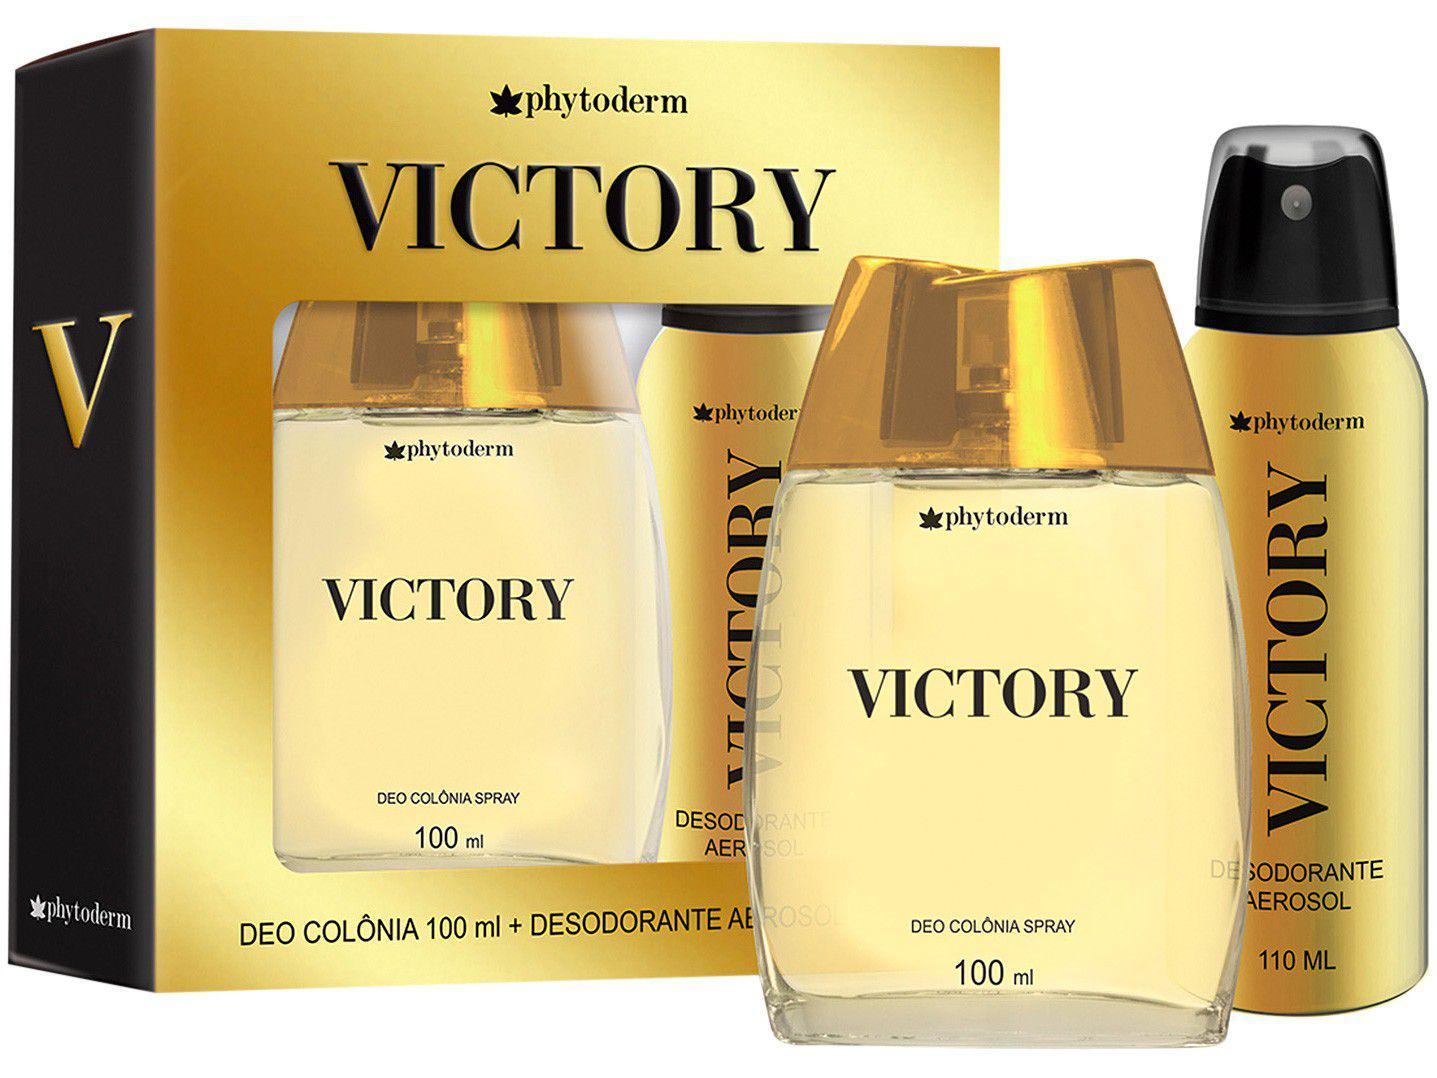 Kit Perfume Phytoderm Victory Masculino - Deo Colônia 2 Unidades